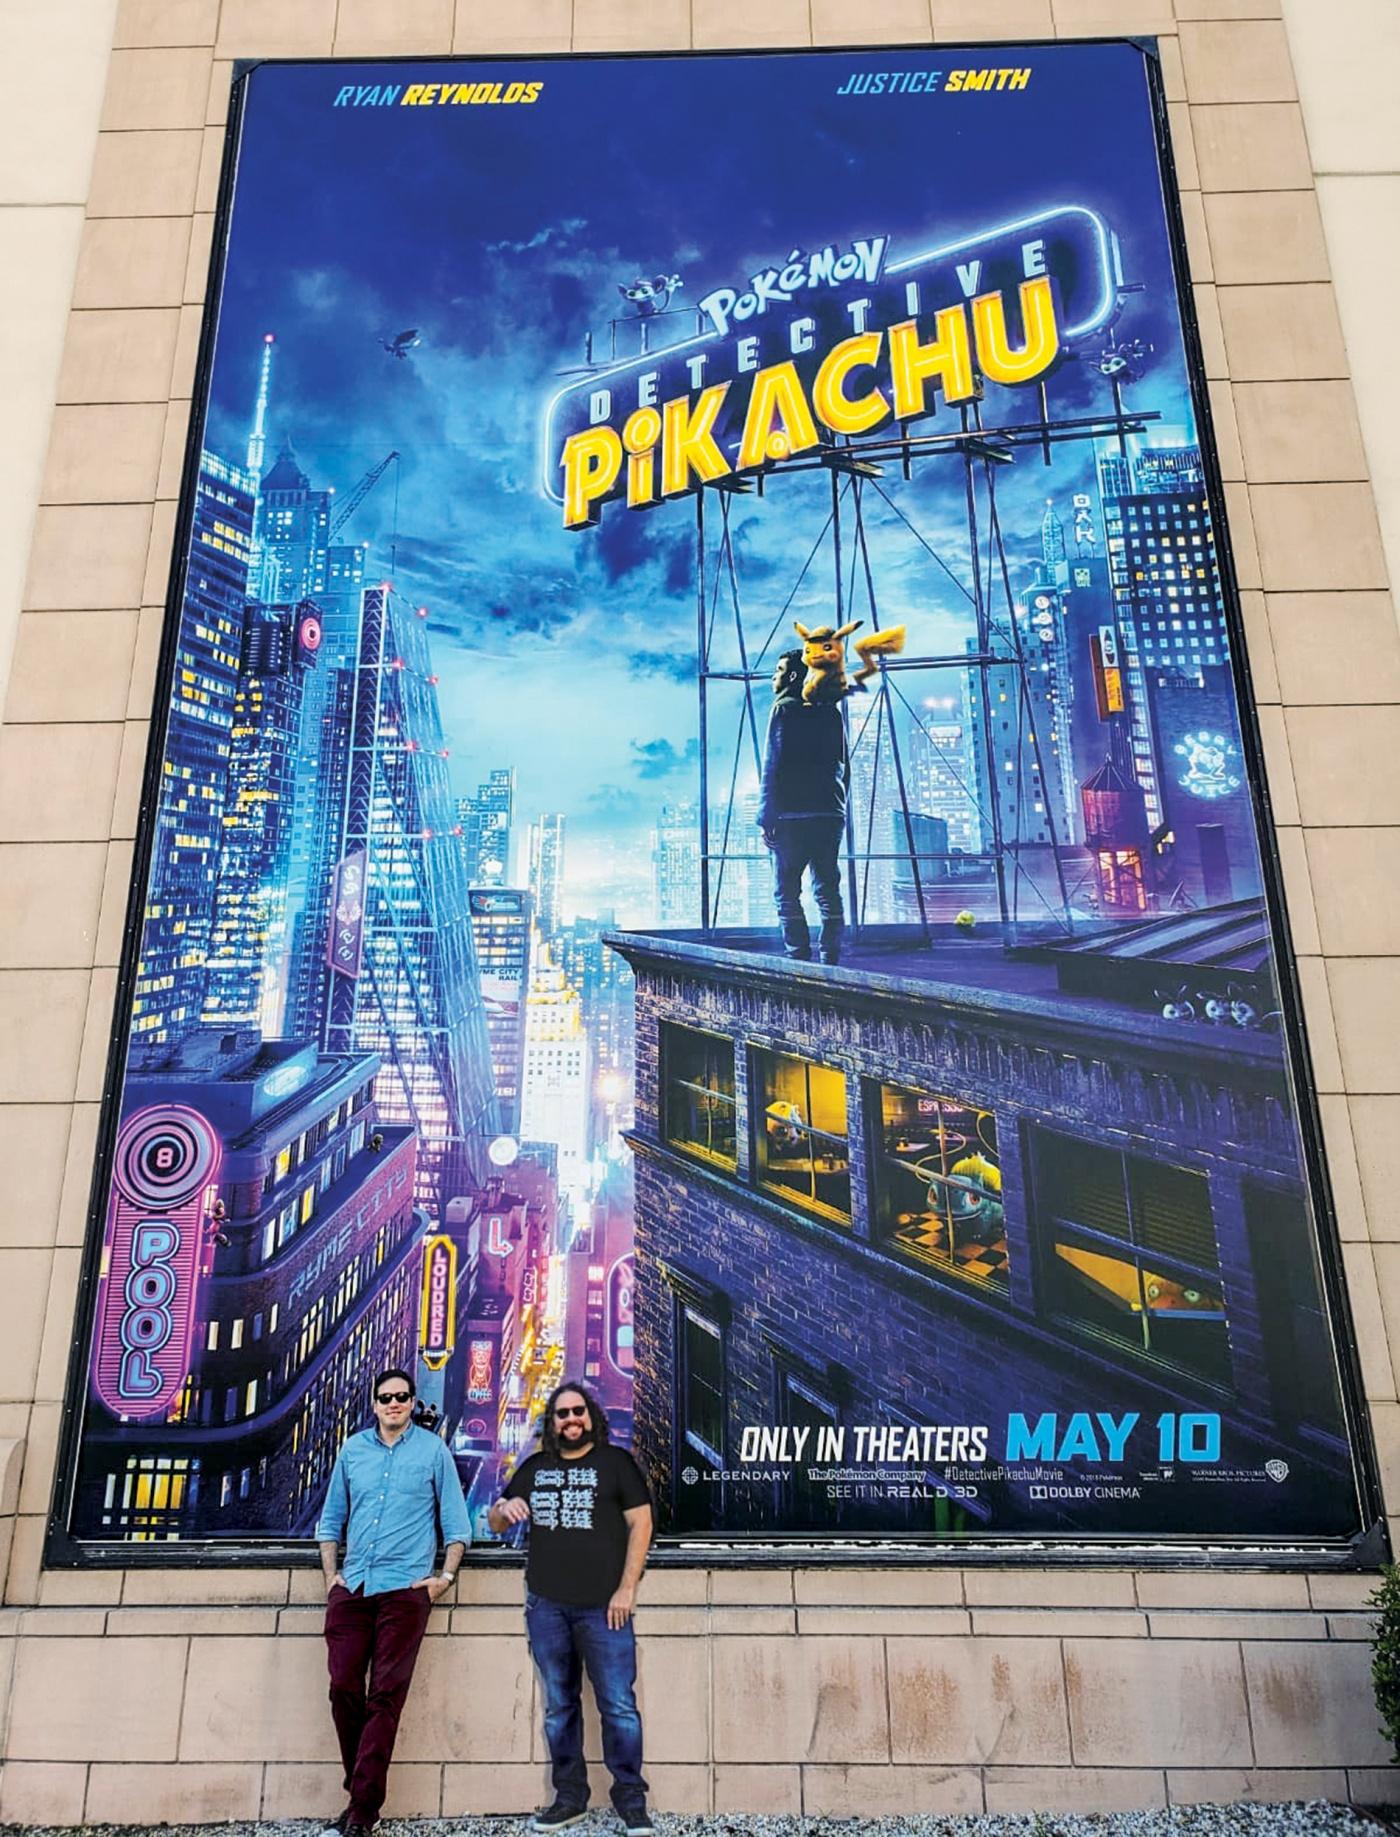 Dan Hernandez '06 and Benji Samit '06 standing in front of a Pokémon: Detective Pikachu poster